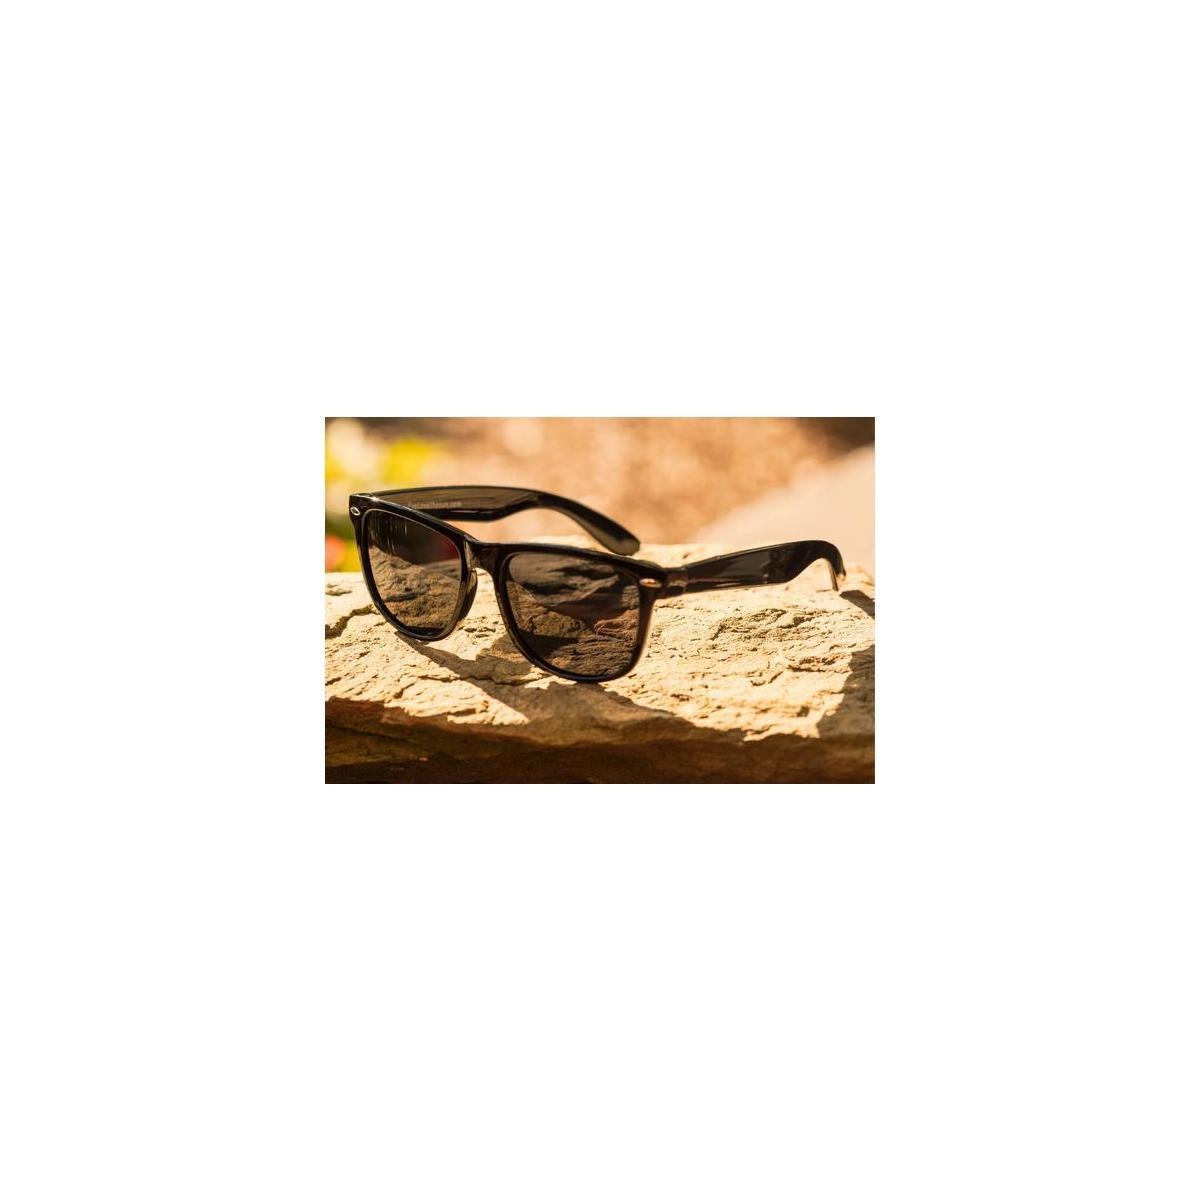 Polarized Black Sunglasses for Men and Women - Glare-Free - 100 Percent Uv Blocking